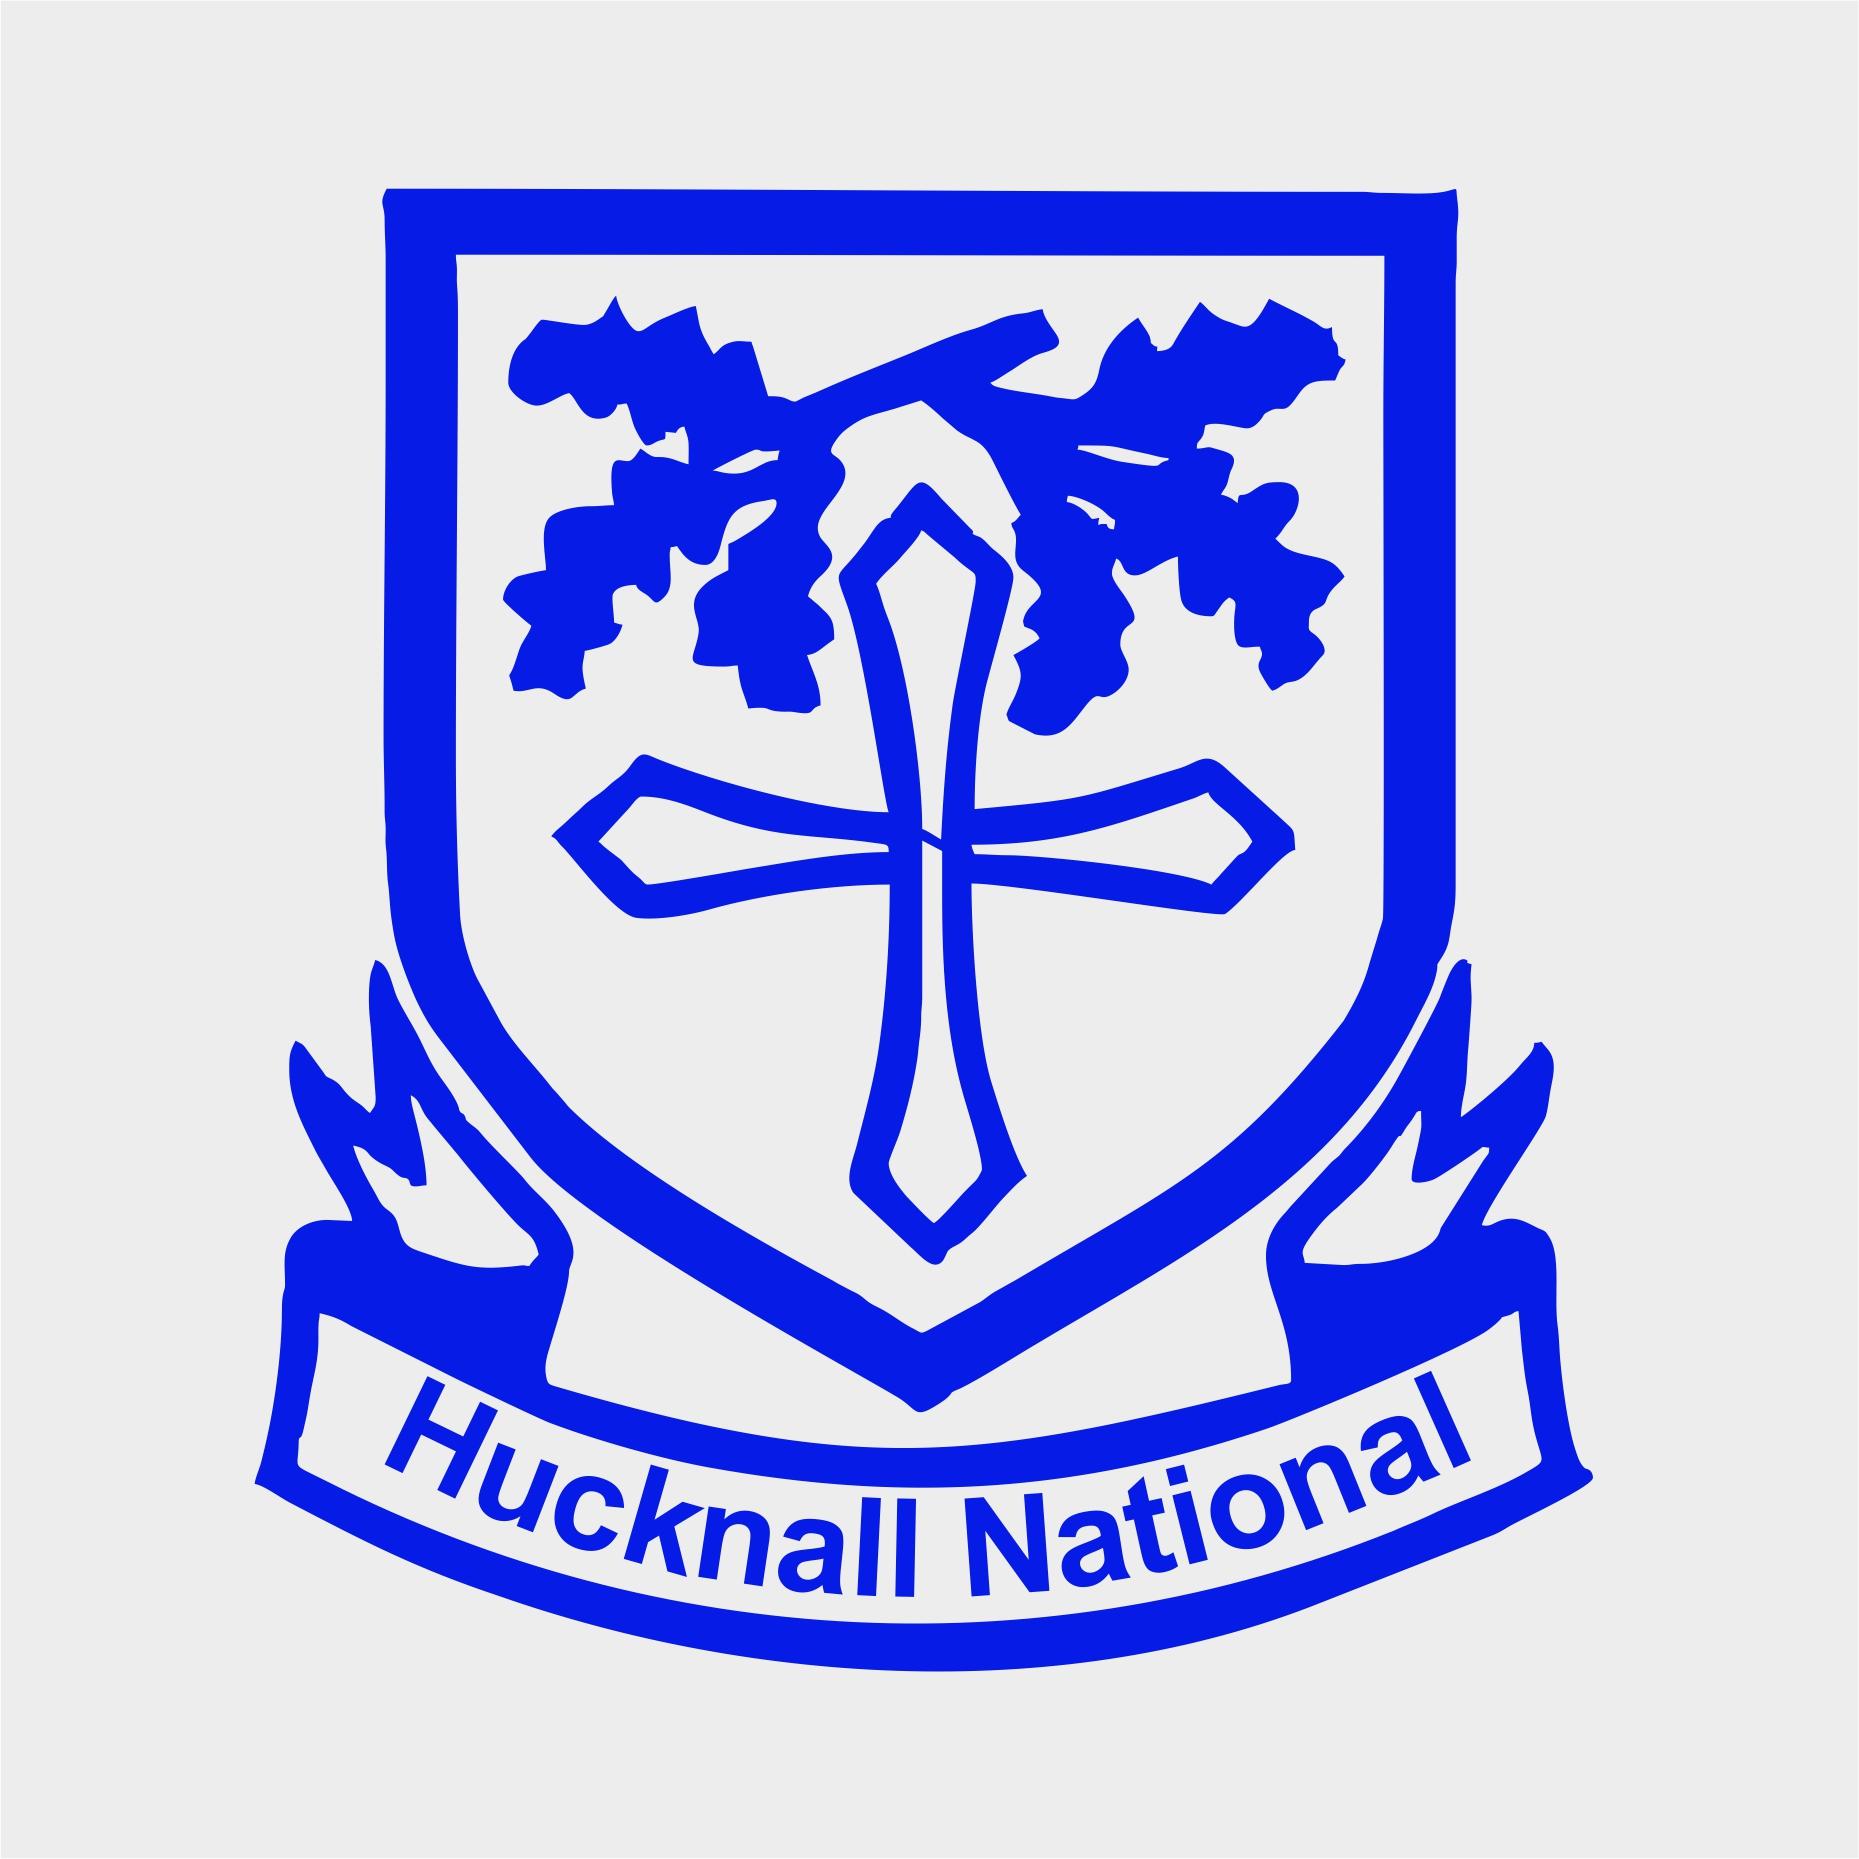 Hucknall National C of E Primary School logo.jpg